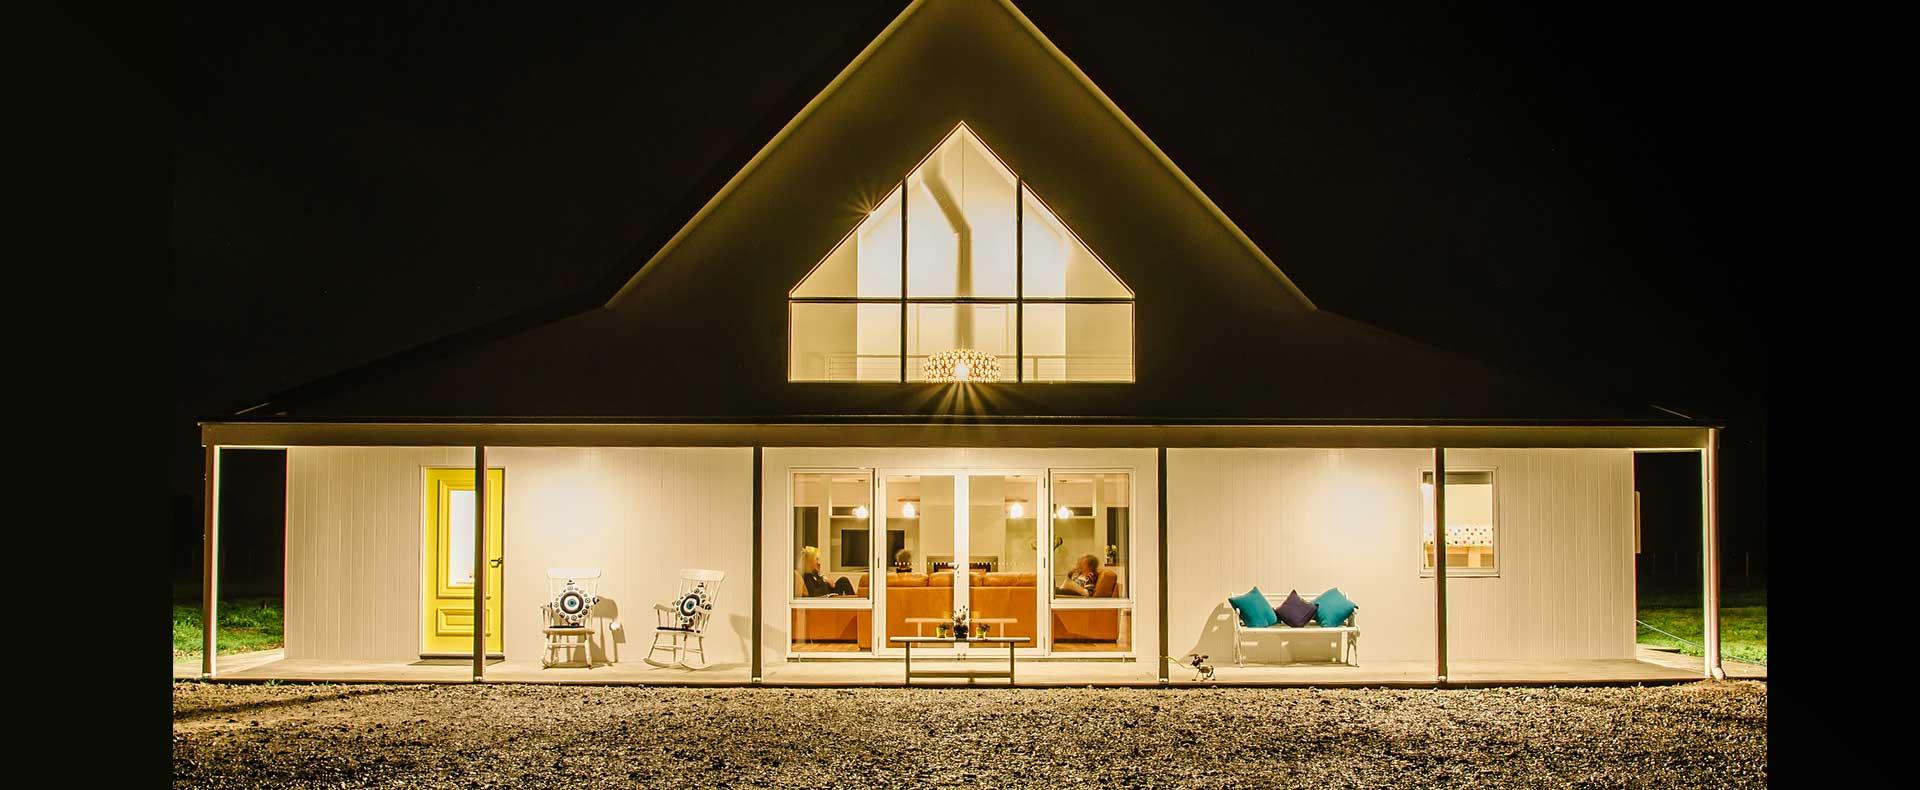 New trend homes tasmania new home builders devonport for New home construction trends